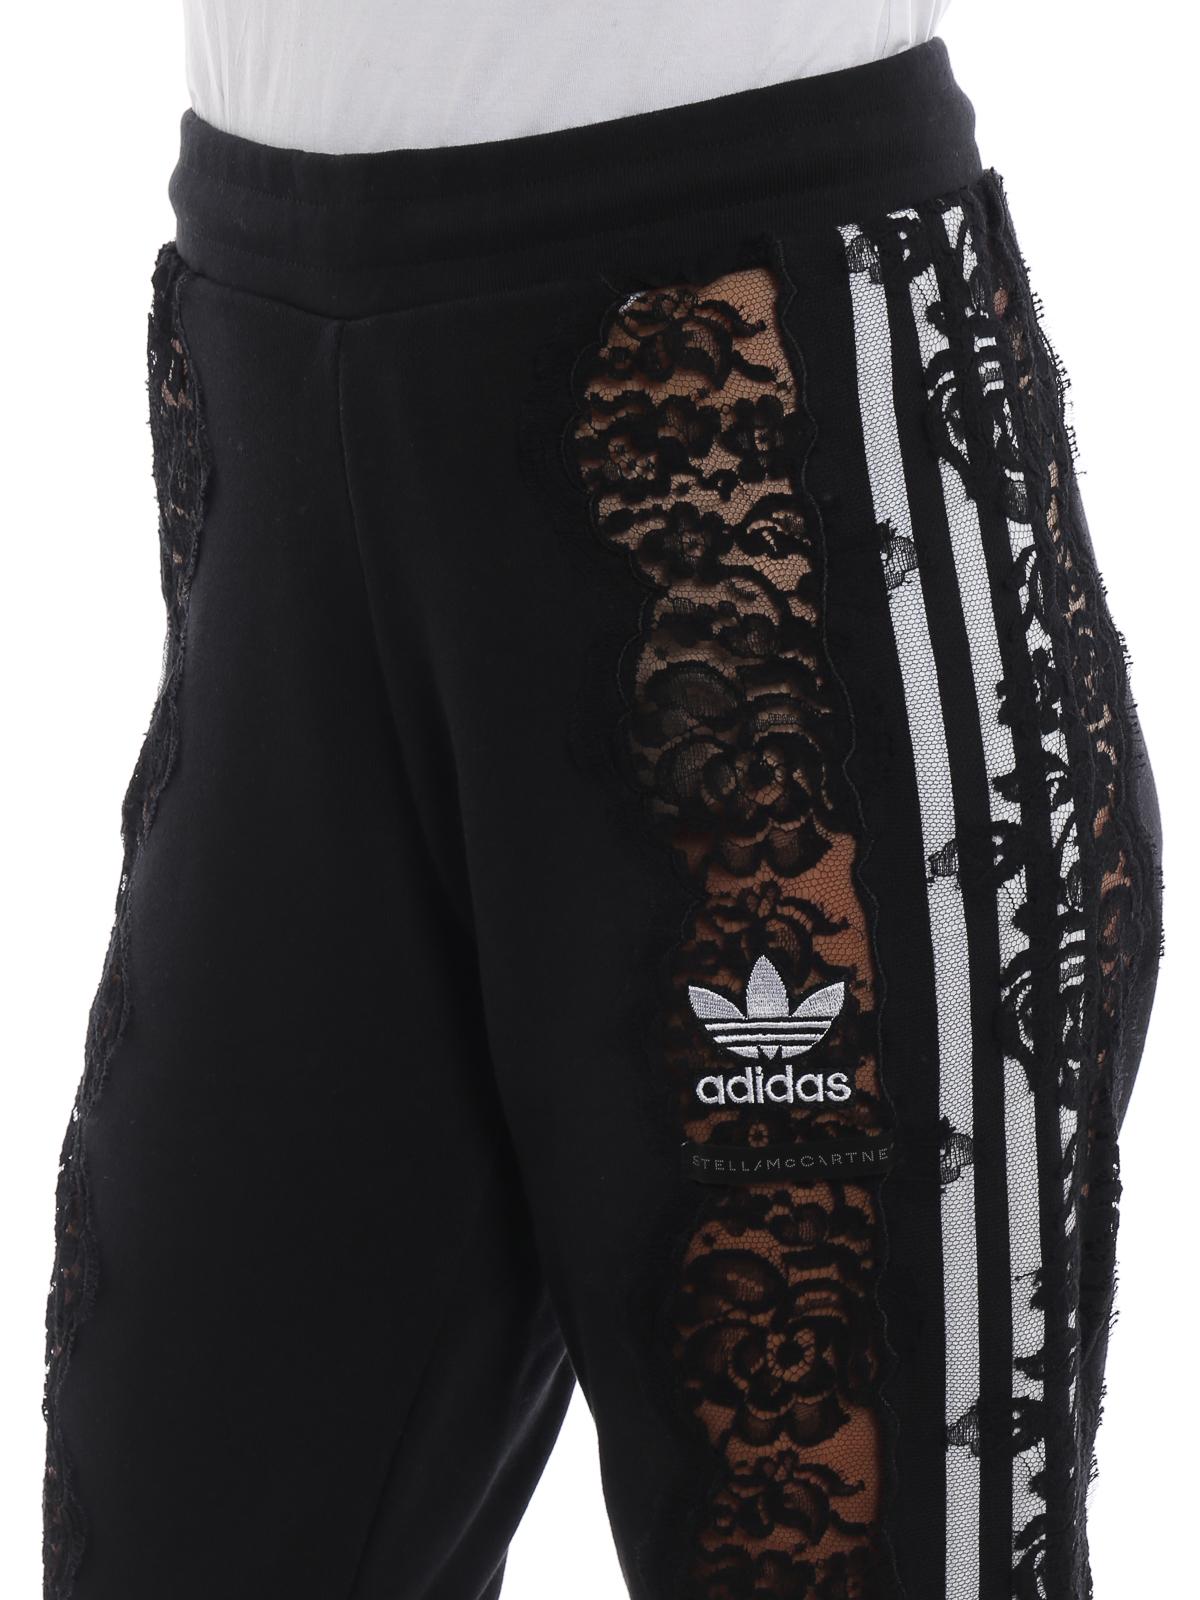 Adidas by Stella McCartney See through lace detail black